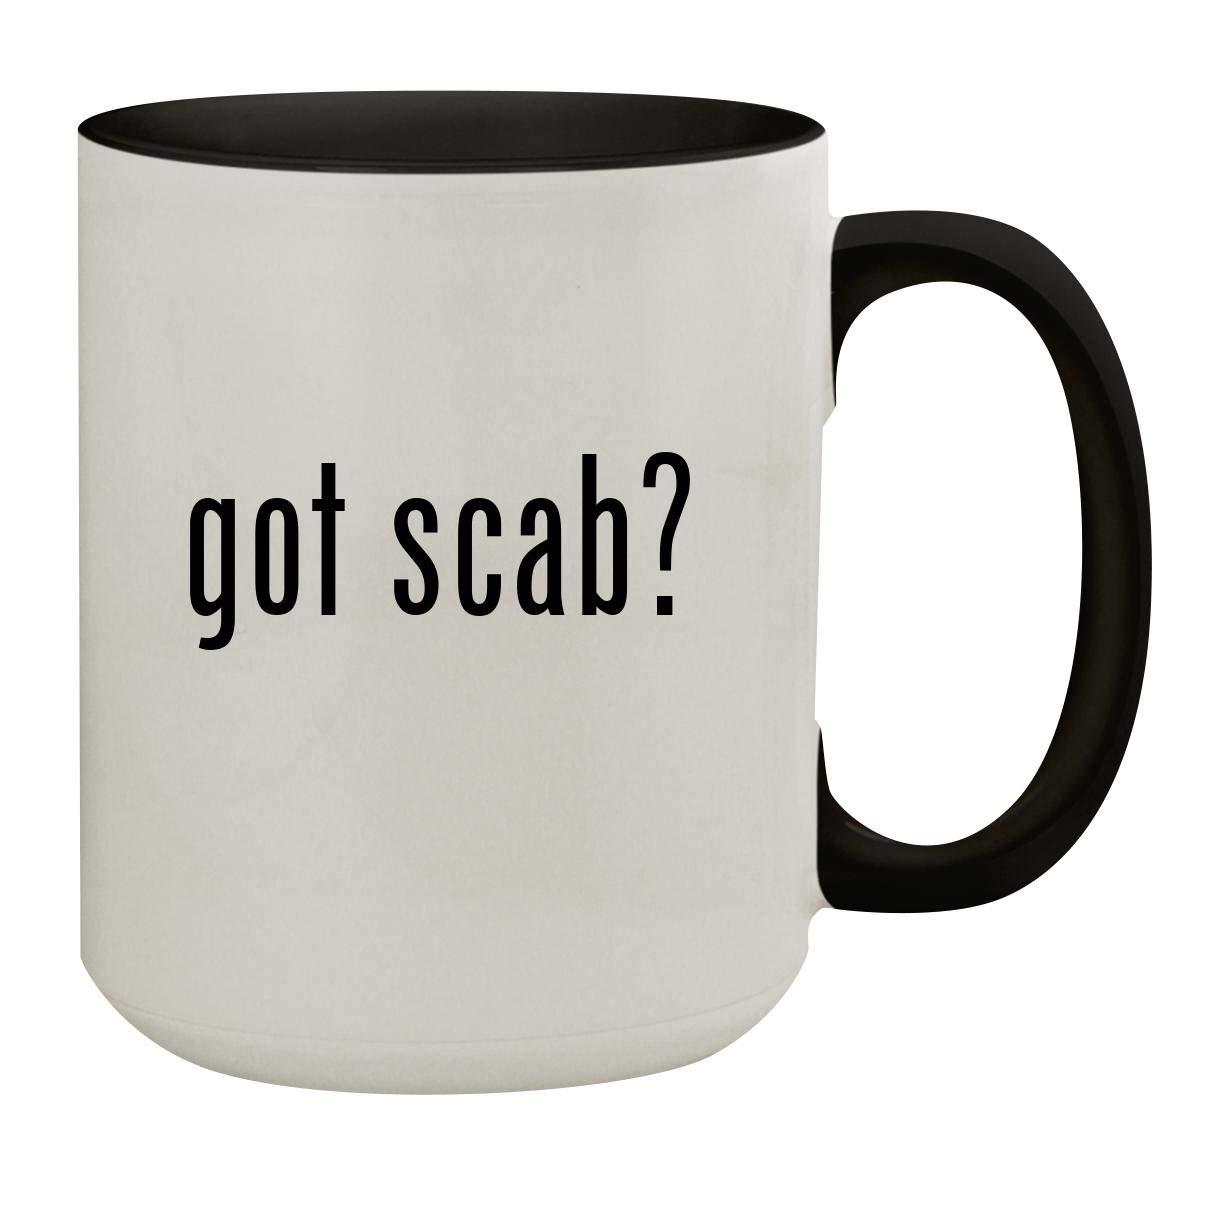 got scab? - 15oz Colored Inner & Handle Ceramic Coffee Mug, Black